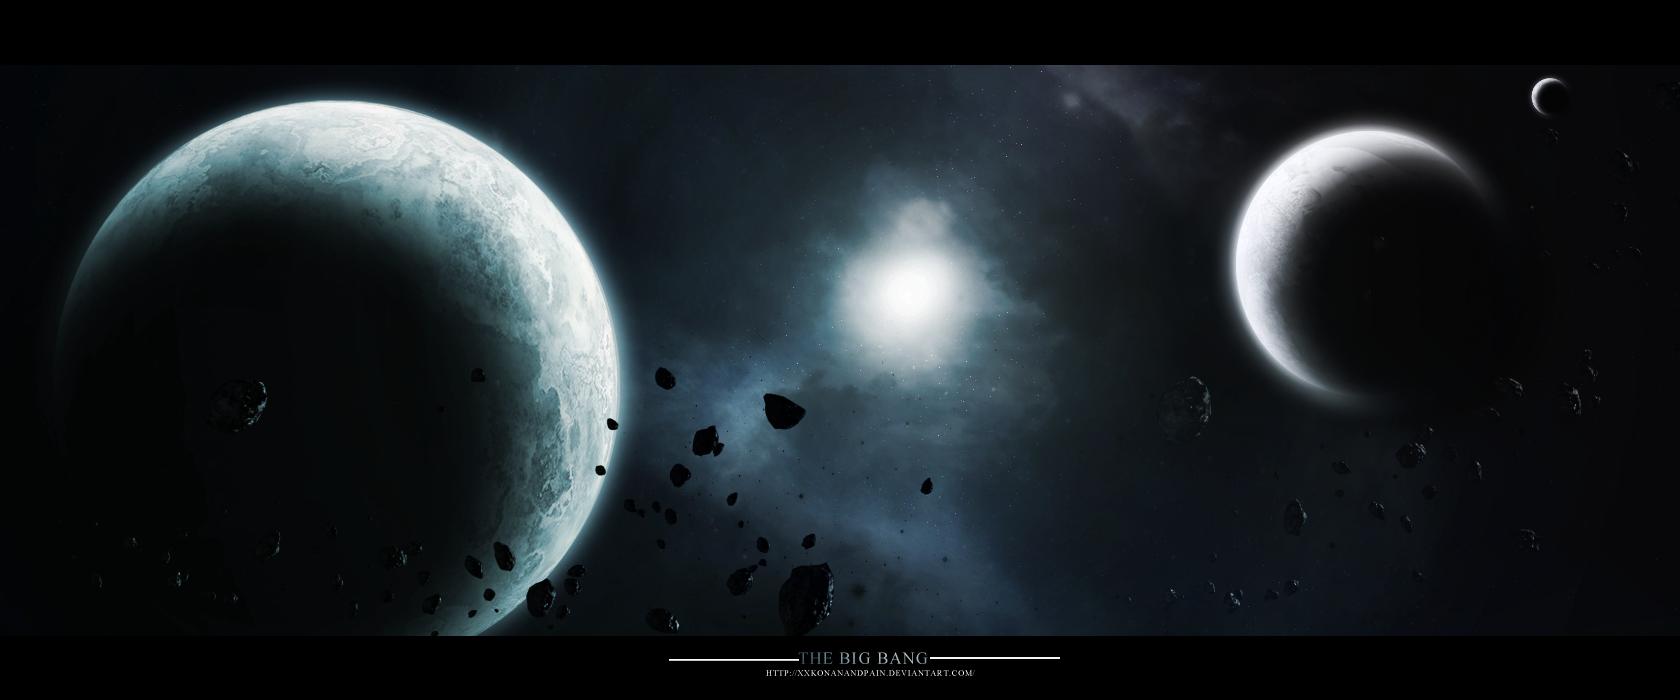 The Big Bang by xXKonanandPain